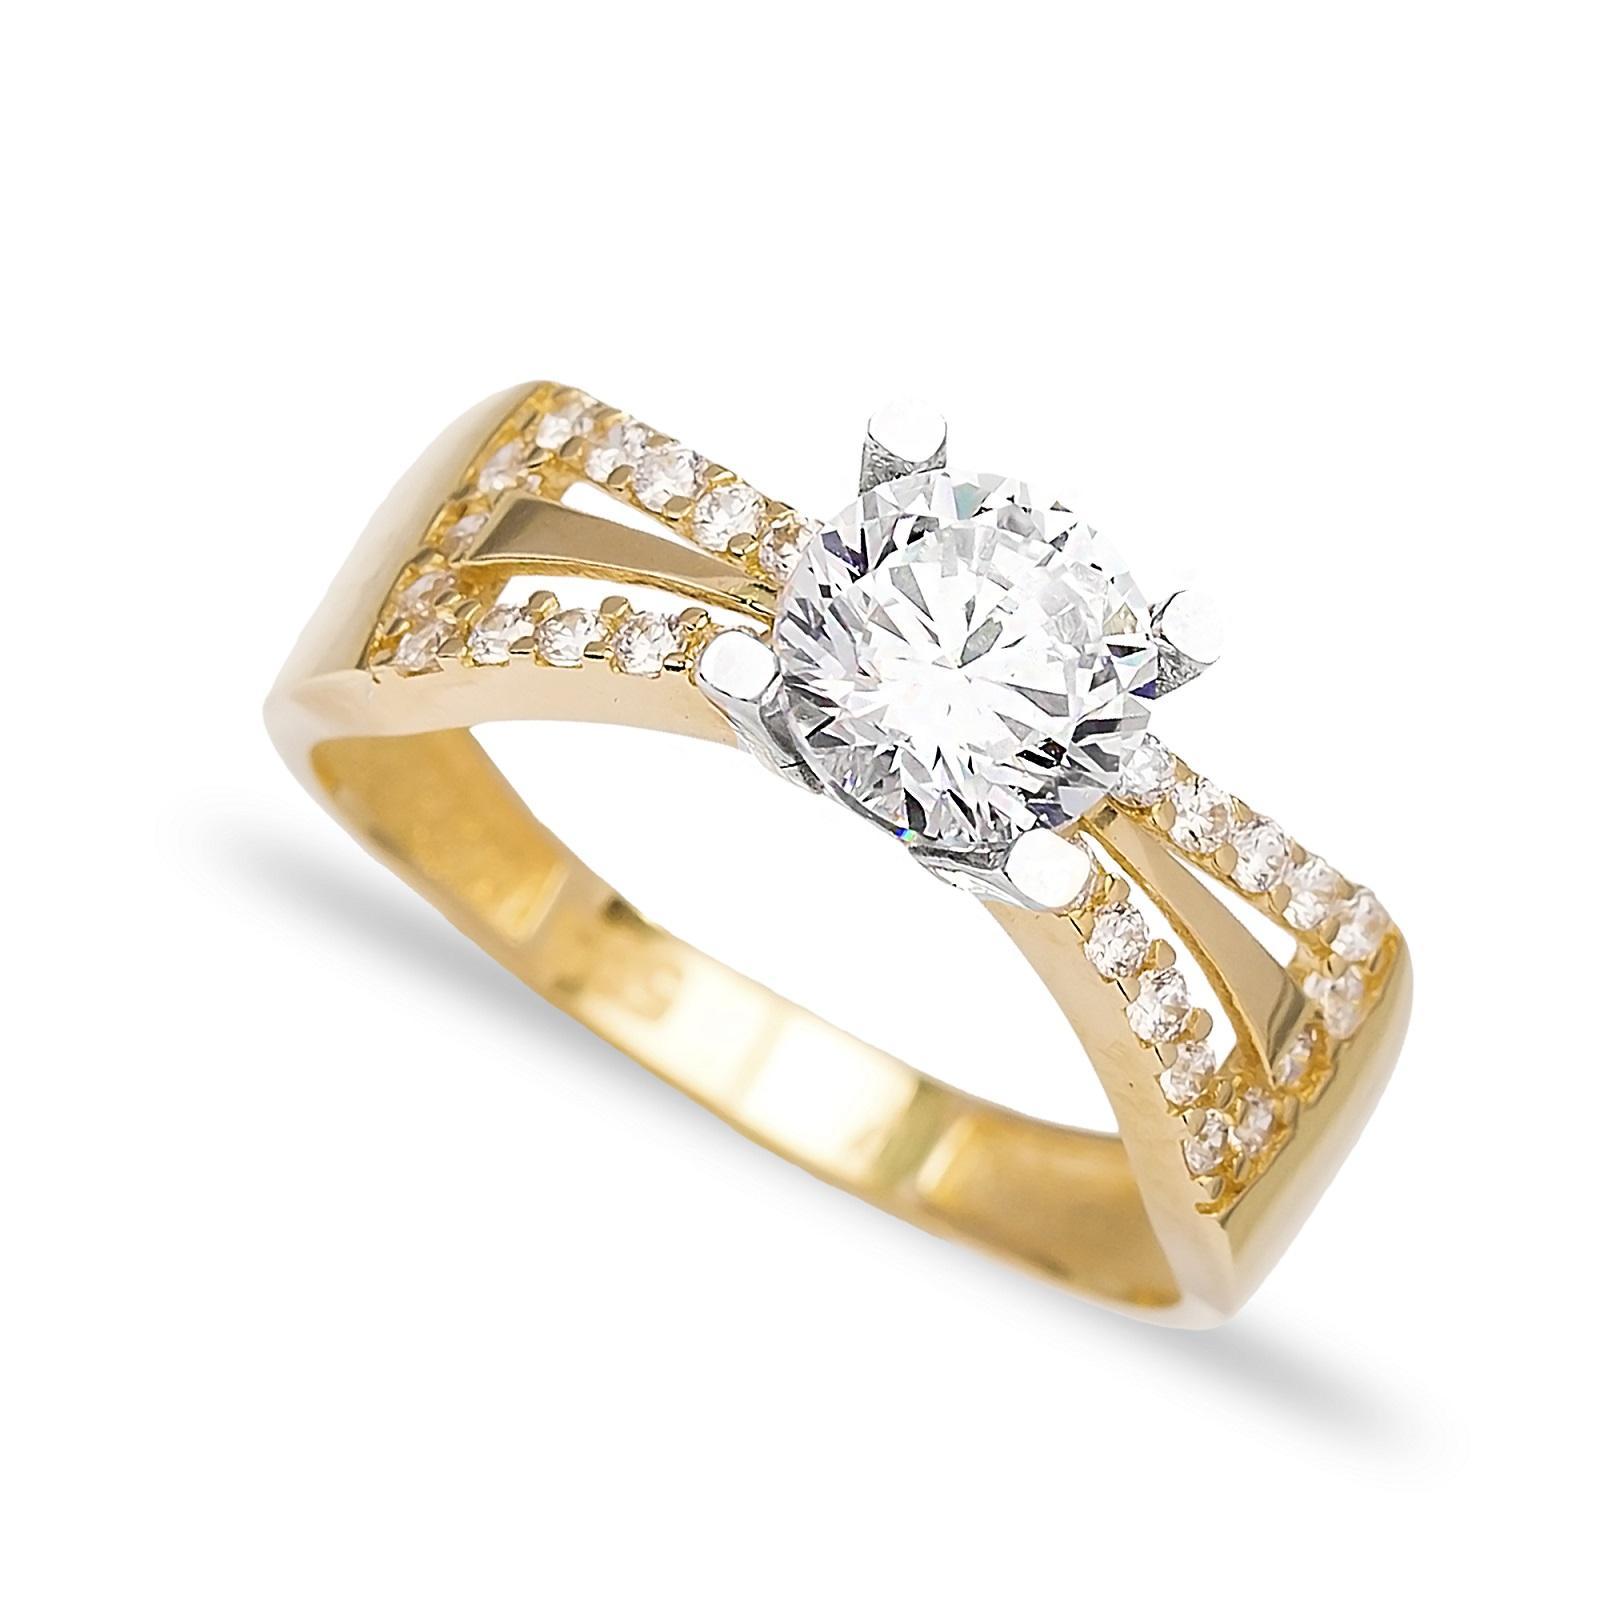 Engagement Solitaire 14 Karat Gold Zirconia 6 mm Wholesale Handmade Turkish Jewelry